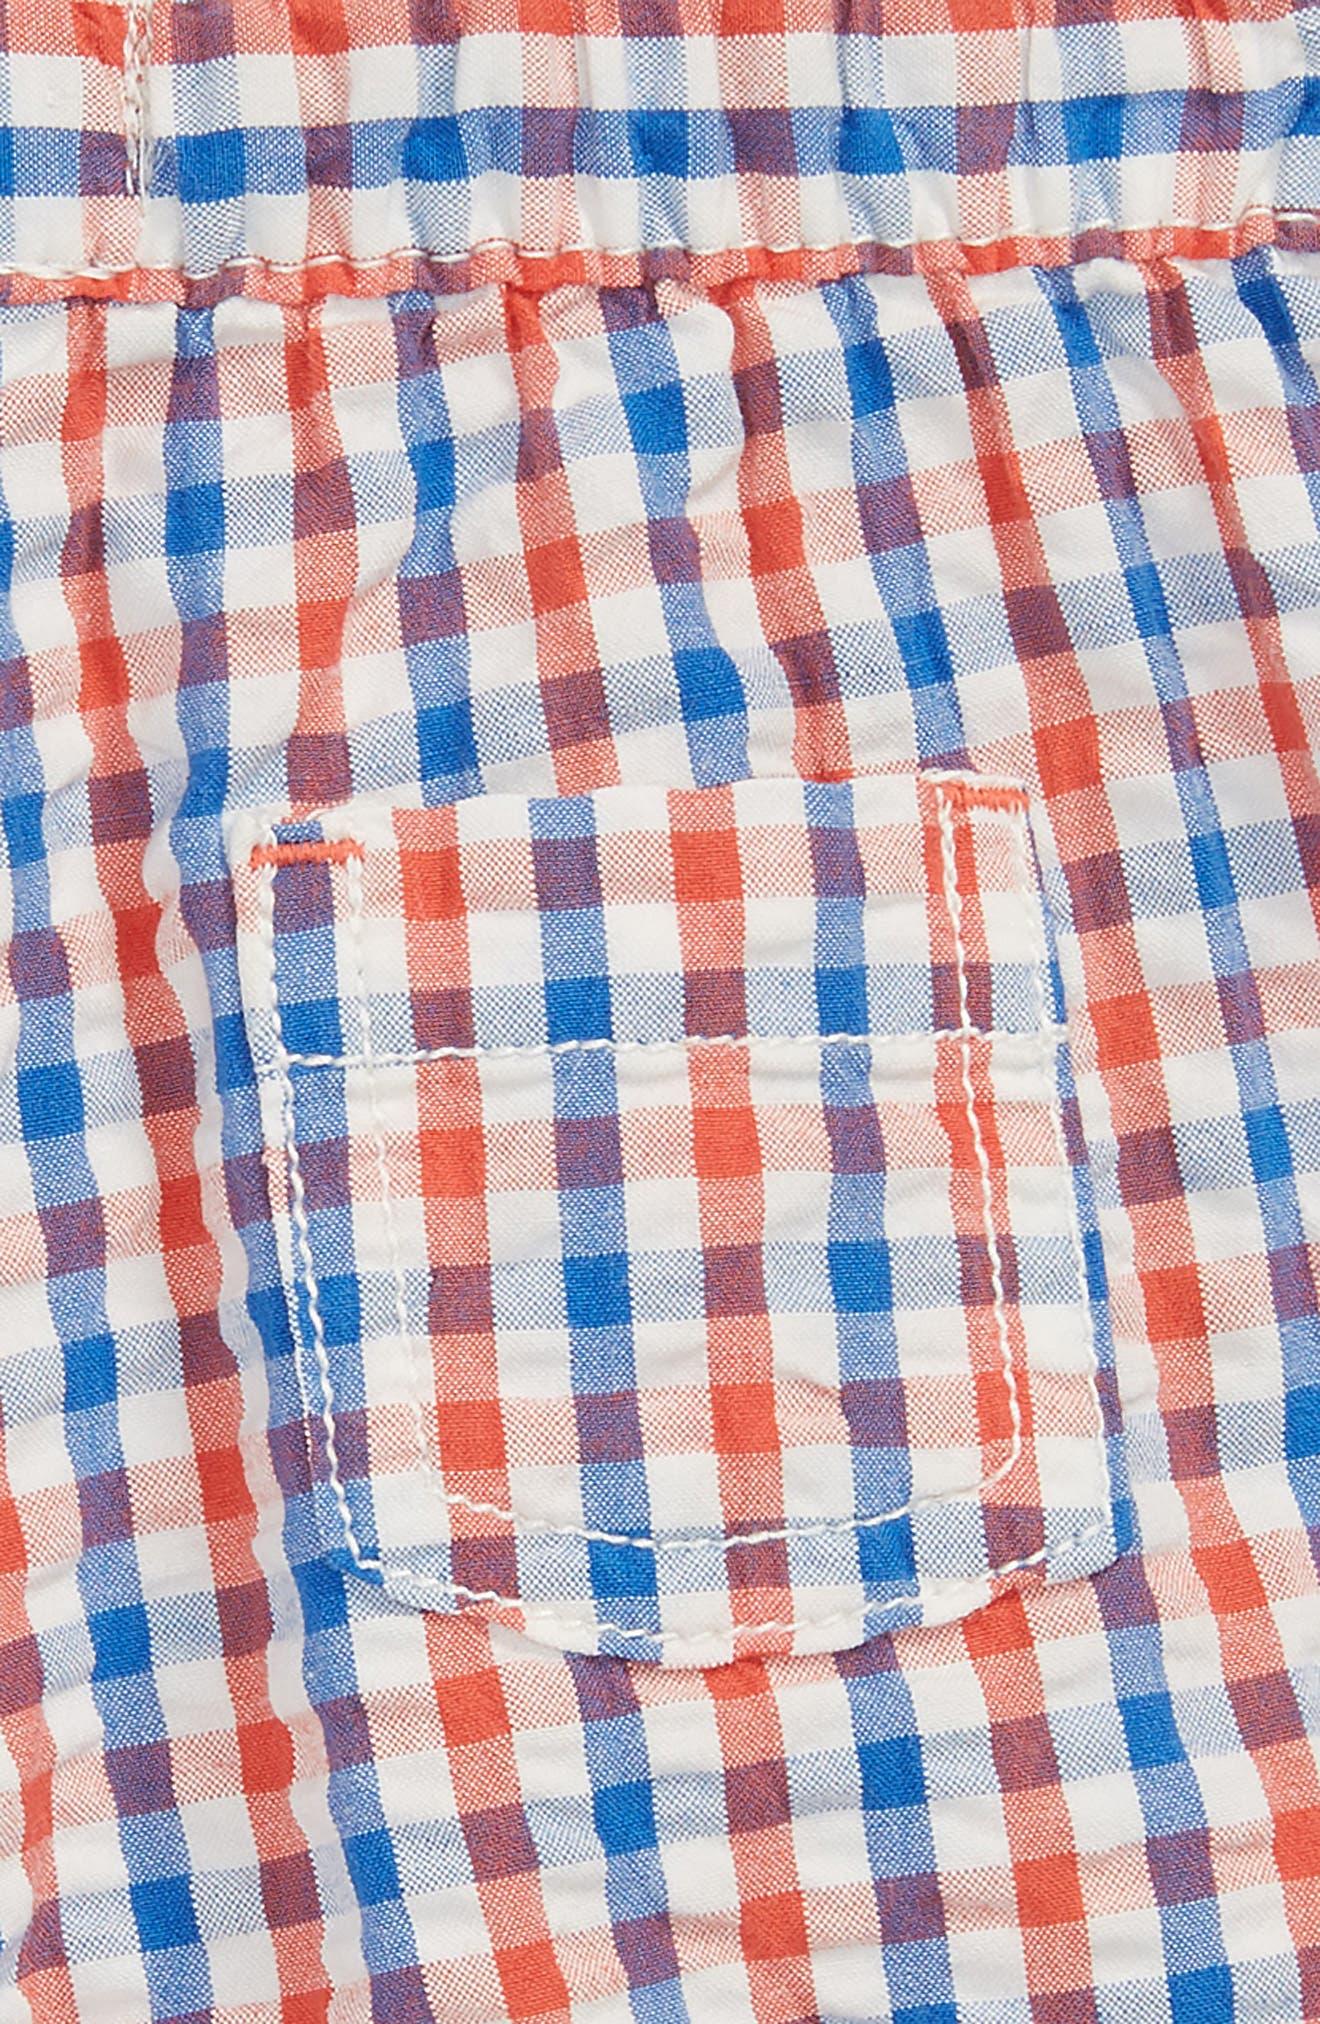 Explorer Gingham Shorts,                             Alternate thumbnail 2, color,                             Soft Red/ Skipper Blue Check